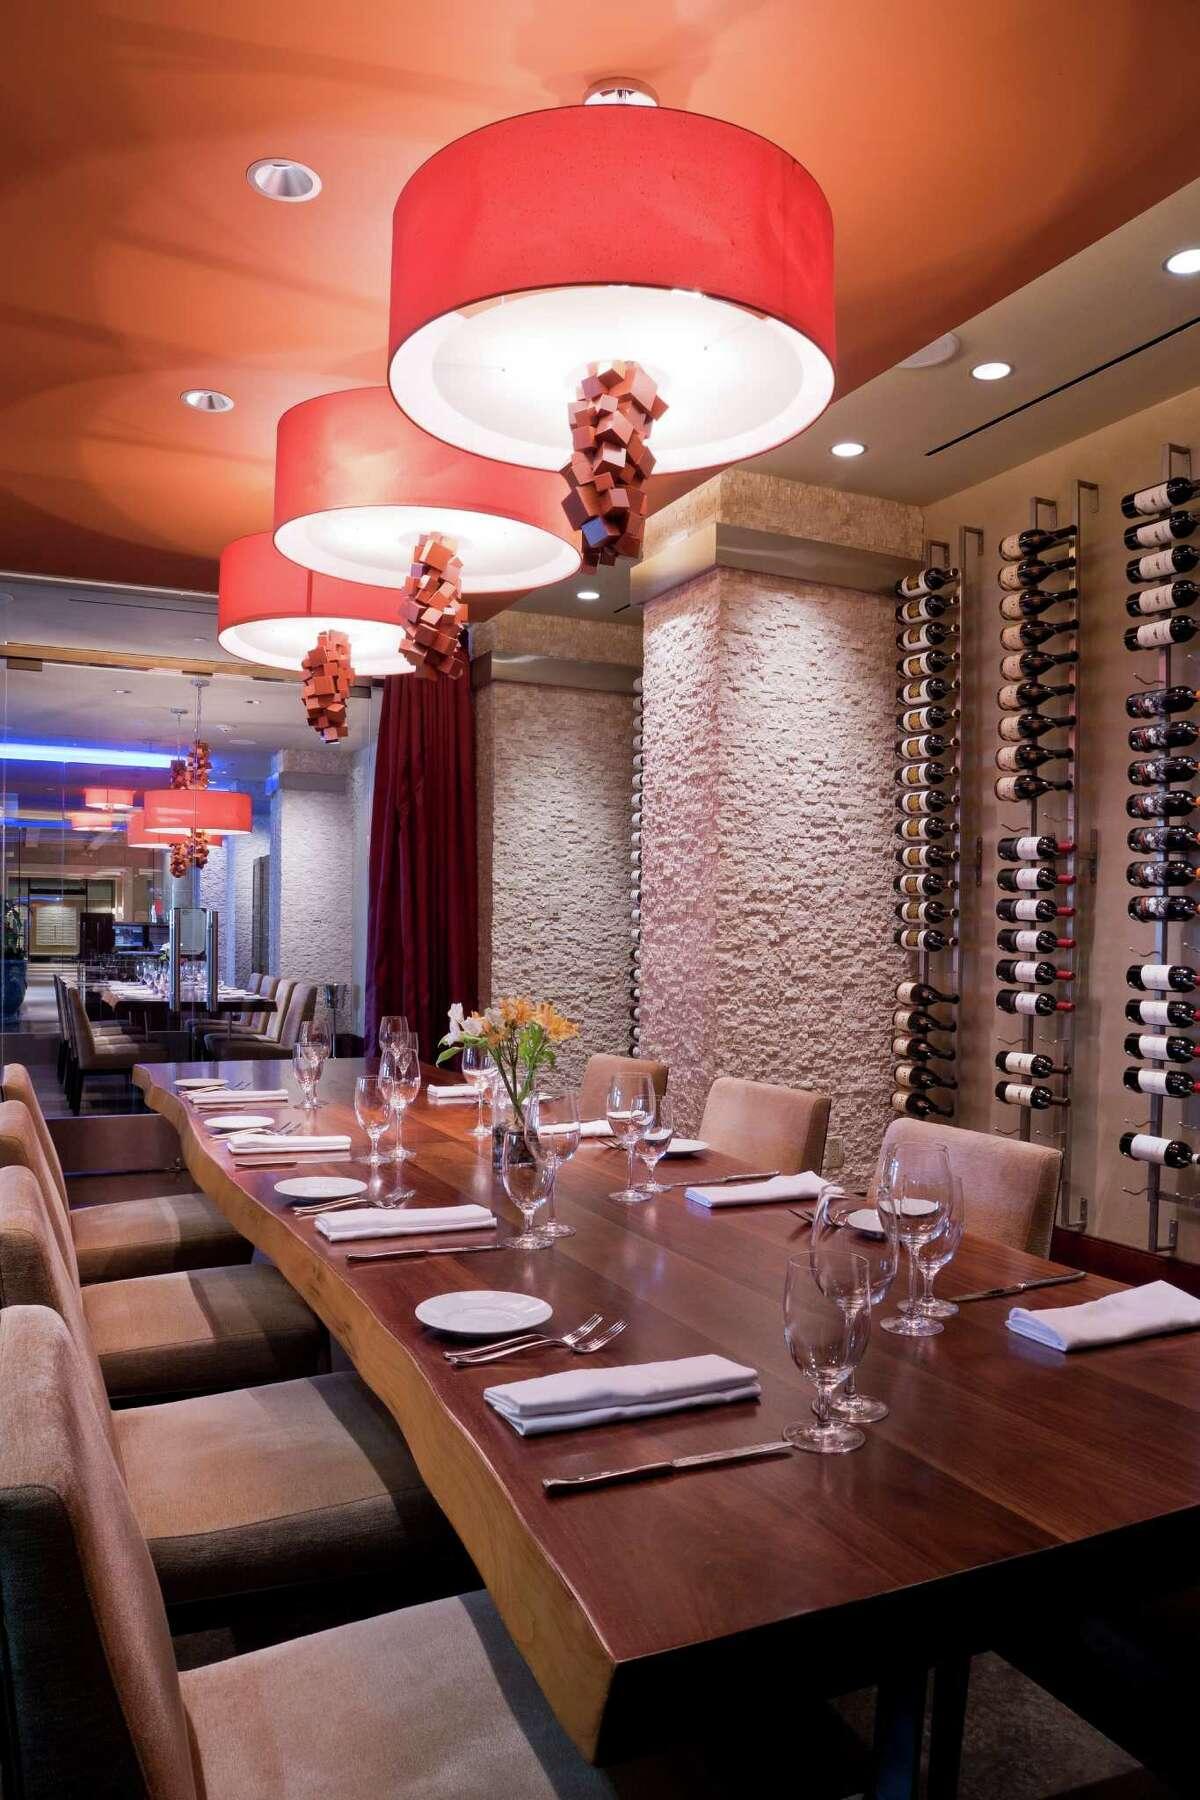 The Sustenio restaurant at the Éilan Hotel & Bar